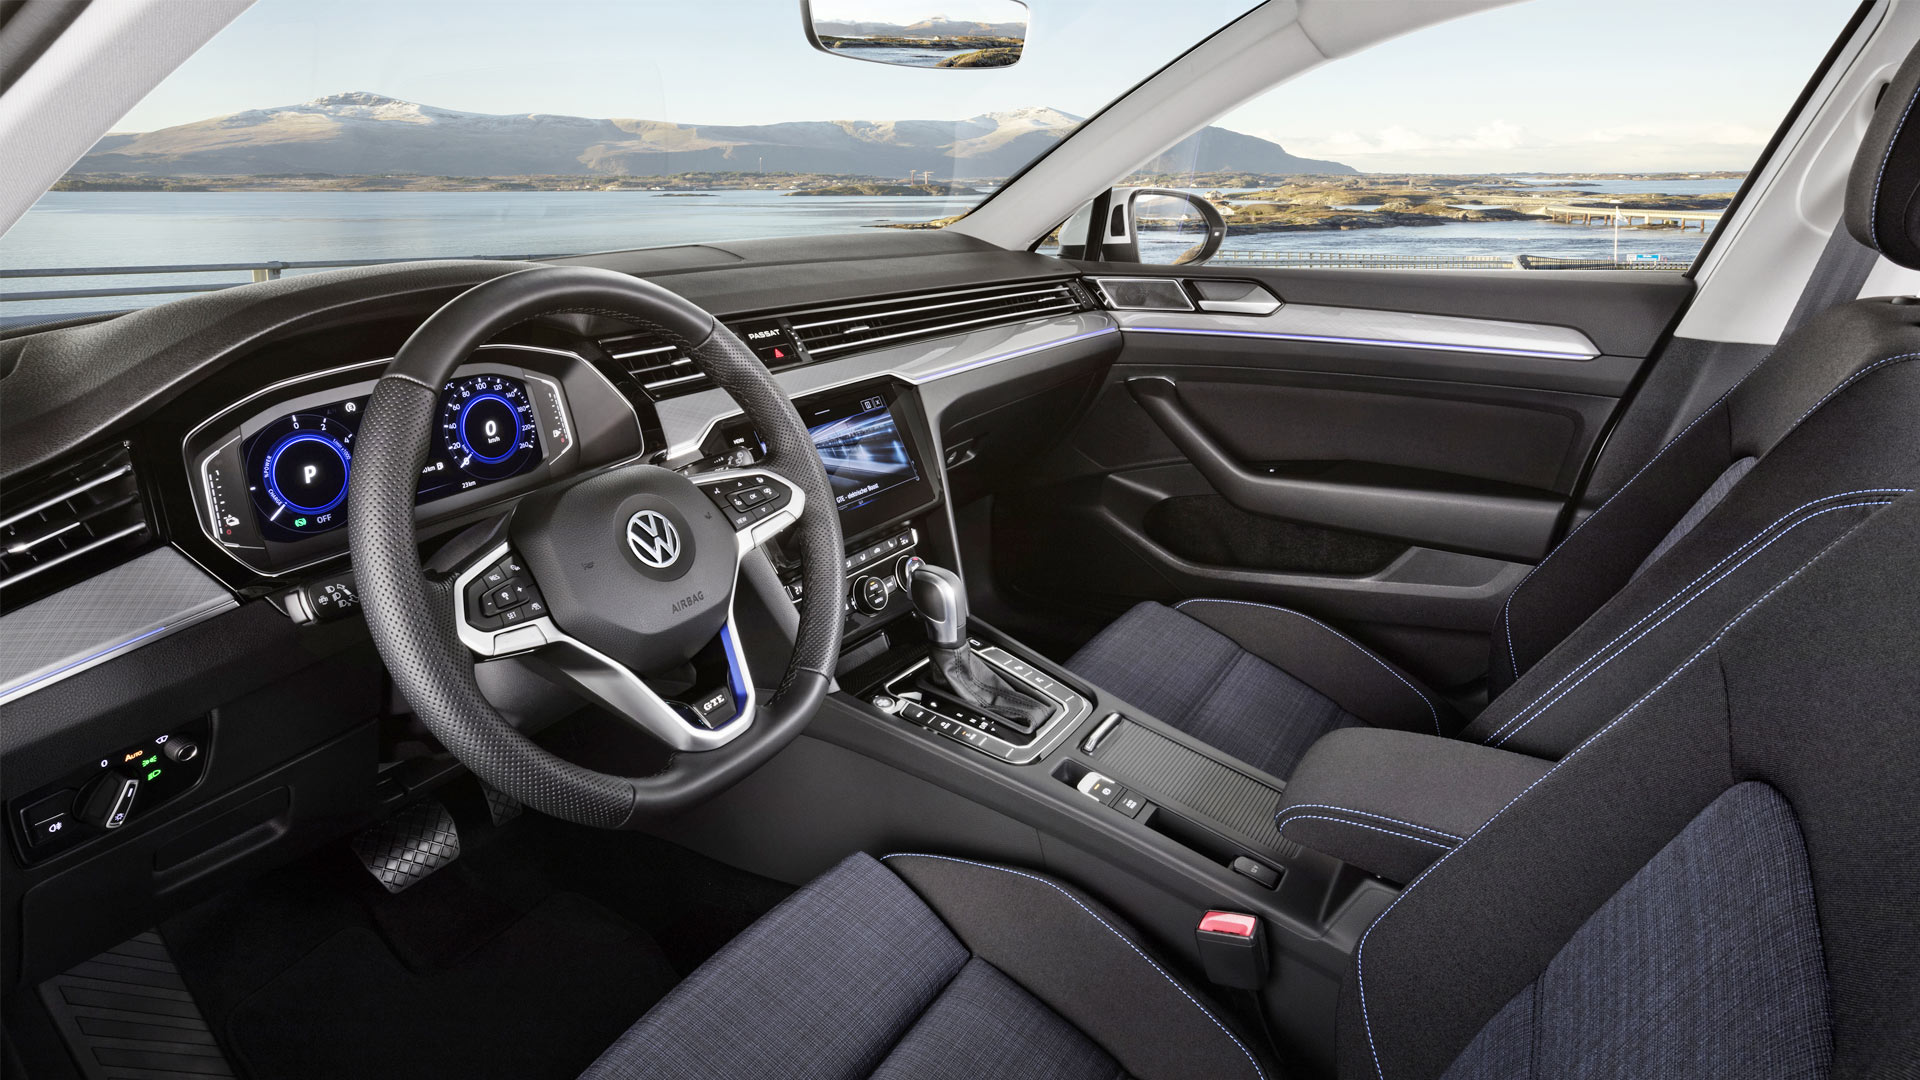 2019-Volkswagen-Passat-GTE-Interior